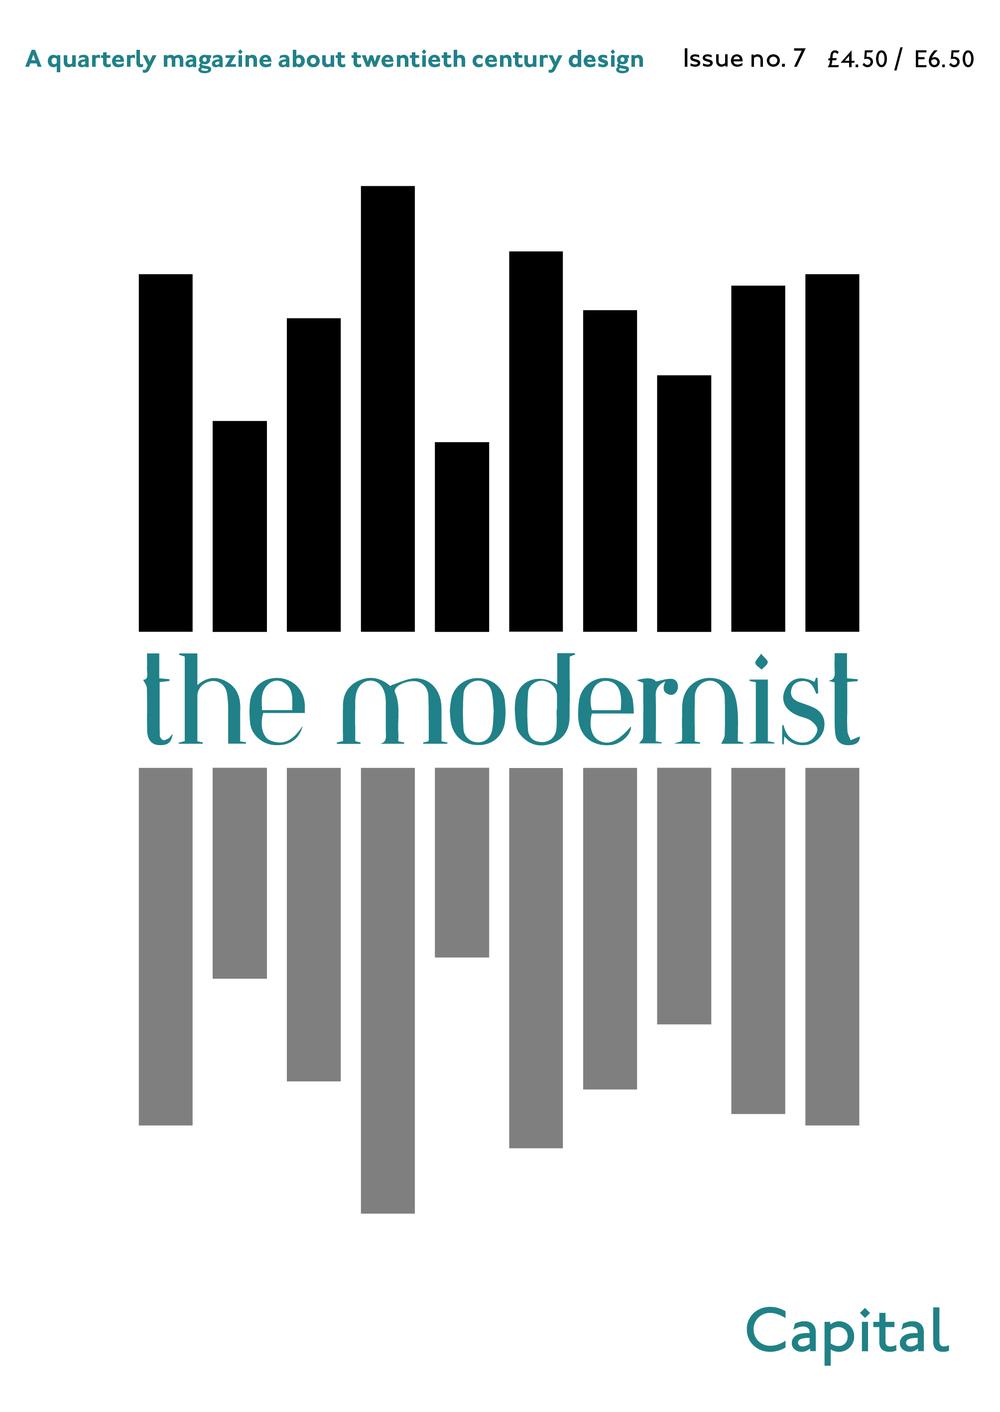 Modernist Magazine Capital